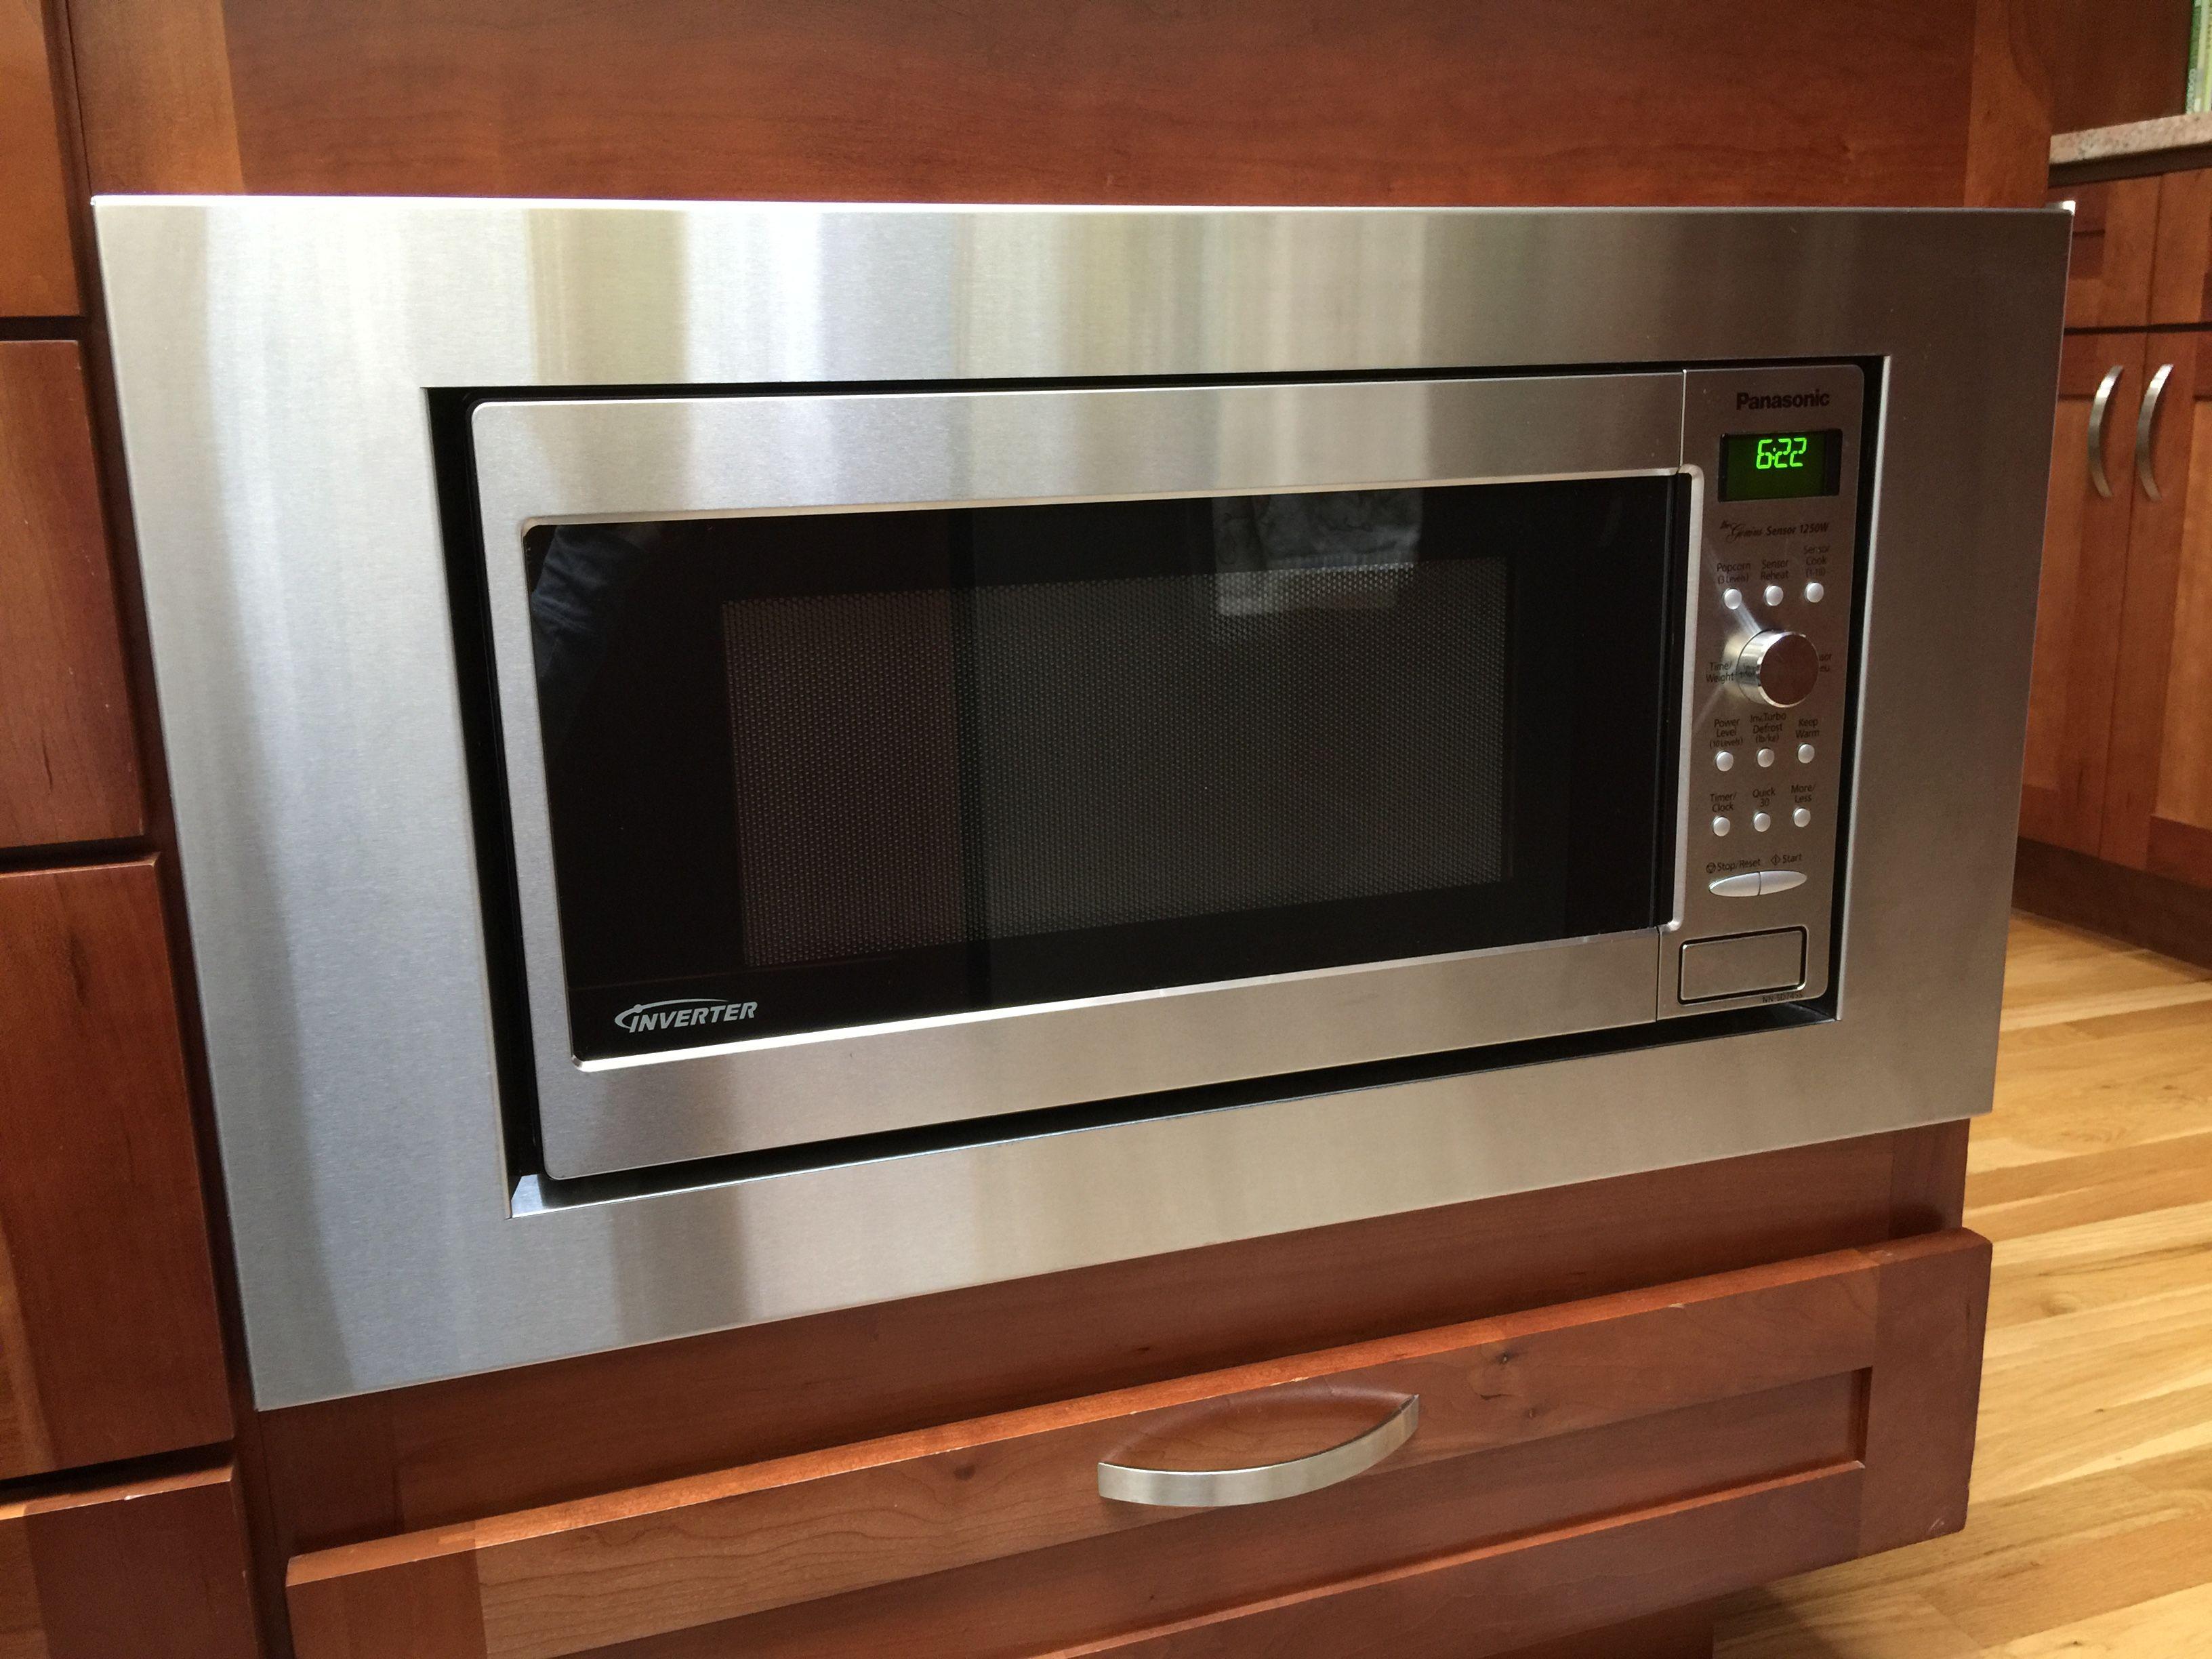 panasonic microwave model nn sd745s